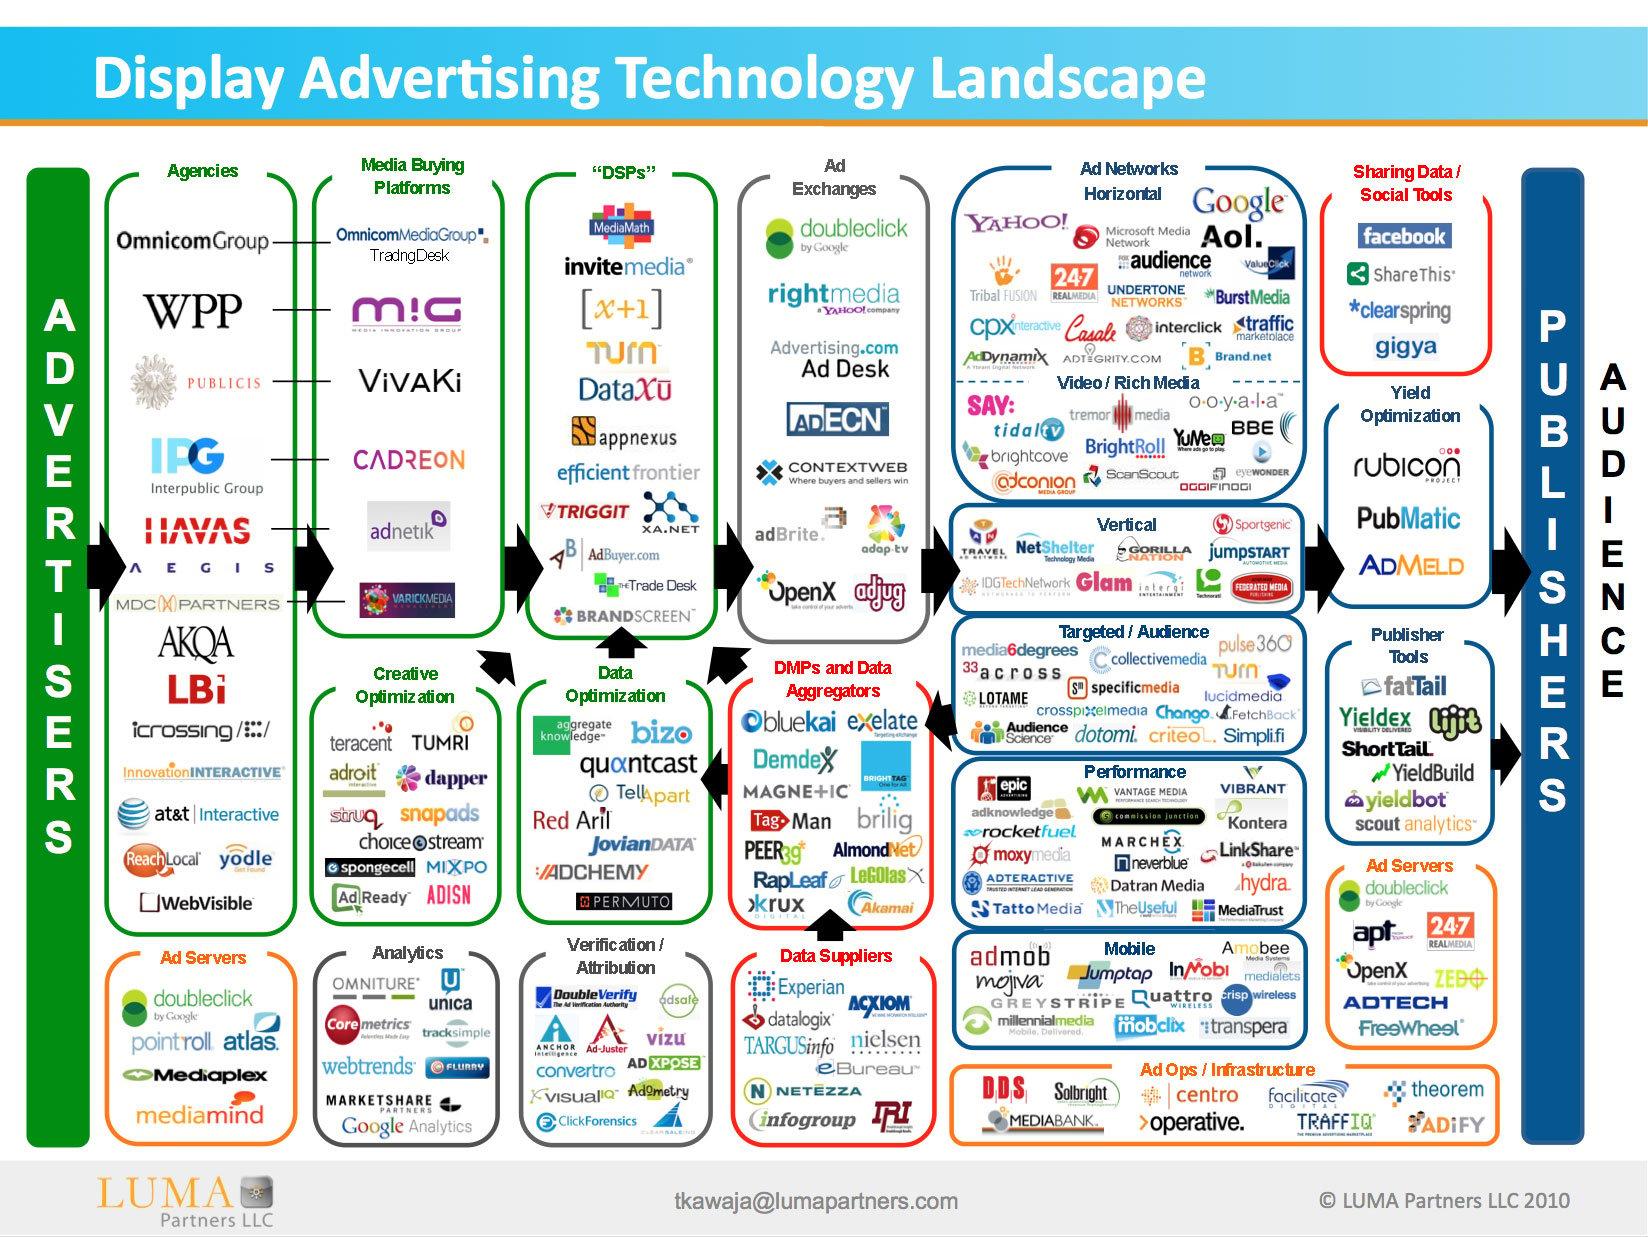 New Ad Tech Ecosystem Map Released By LUMA Partners' Kawaja ...